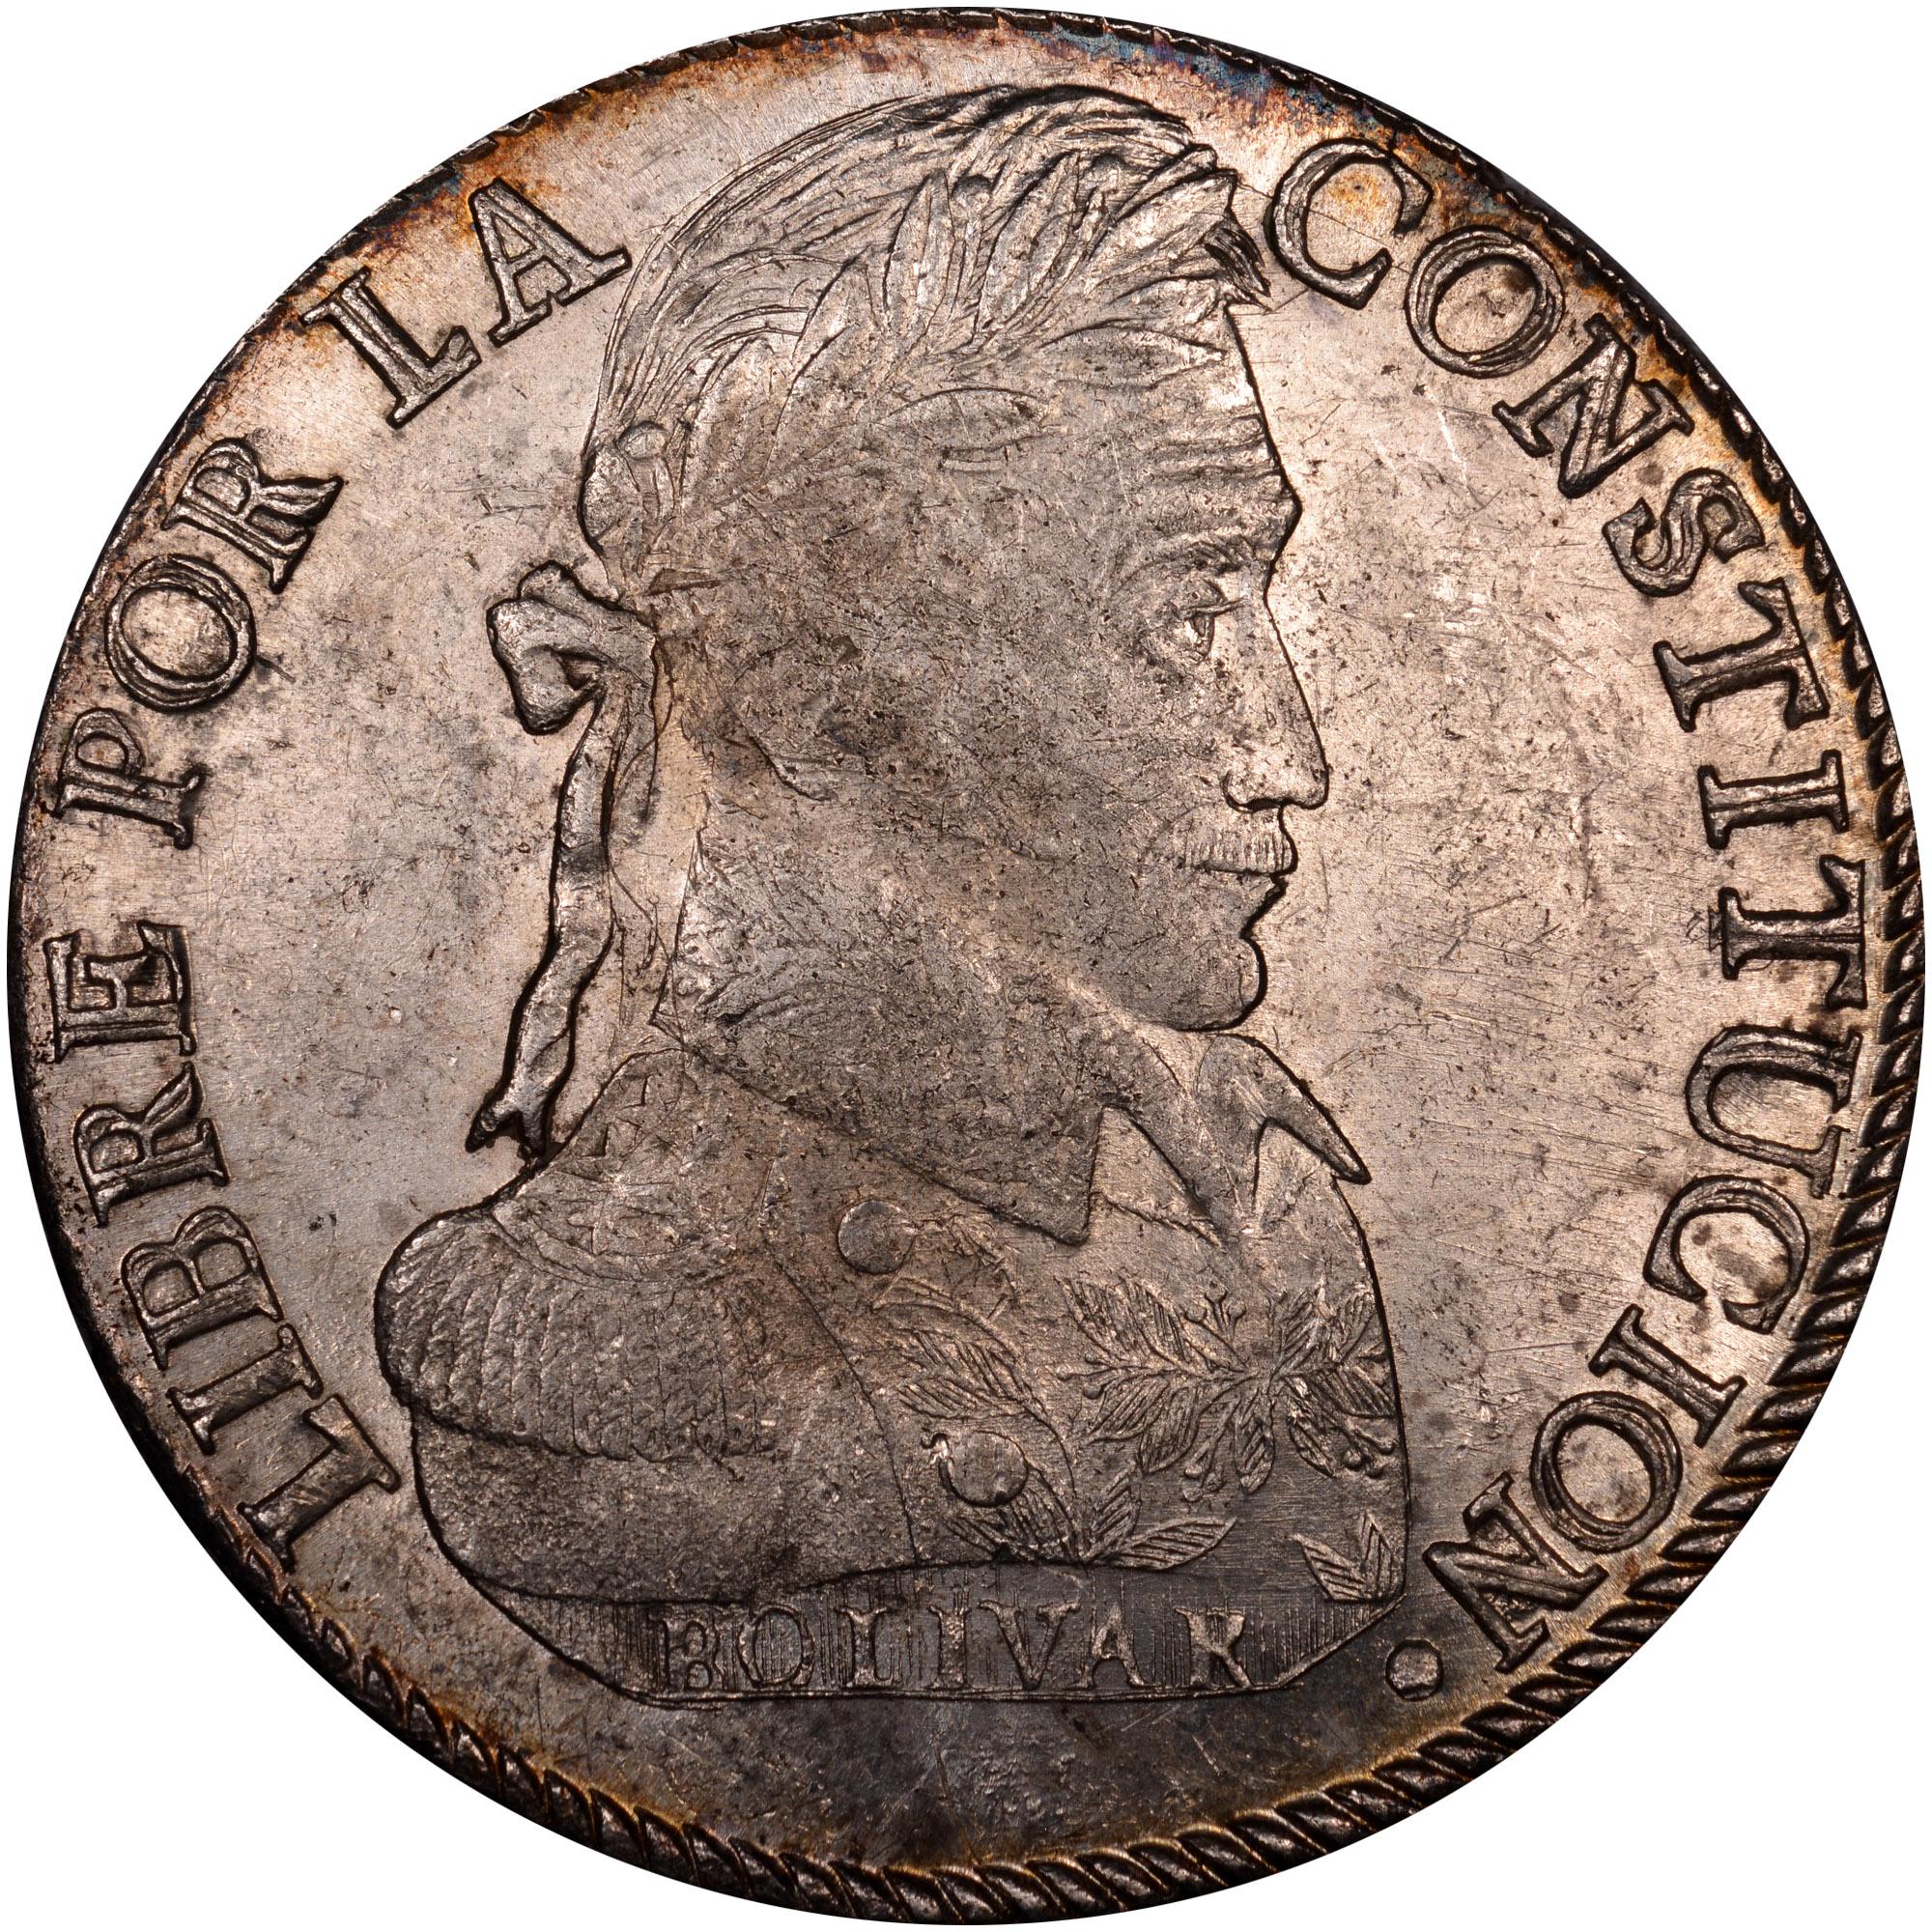 1827-1840 Bolivia 8 Soles reverse